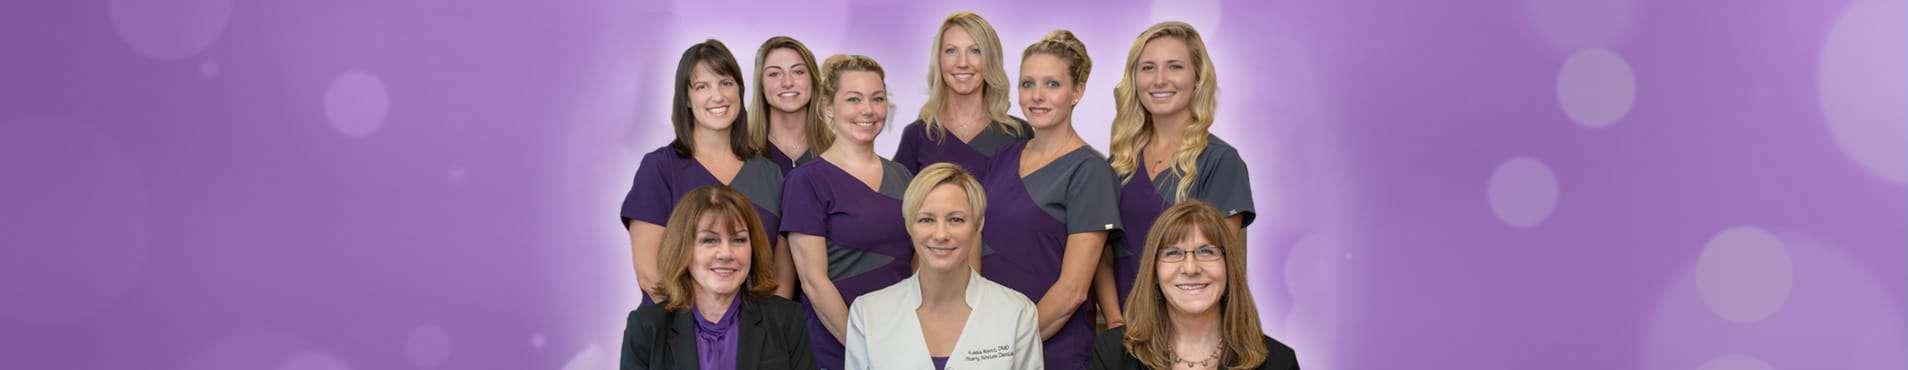 Dental Crowns Dentist Serving Trenton